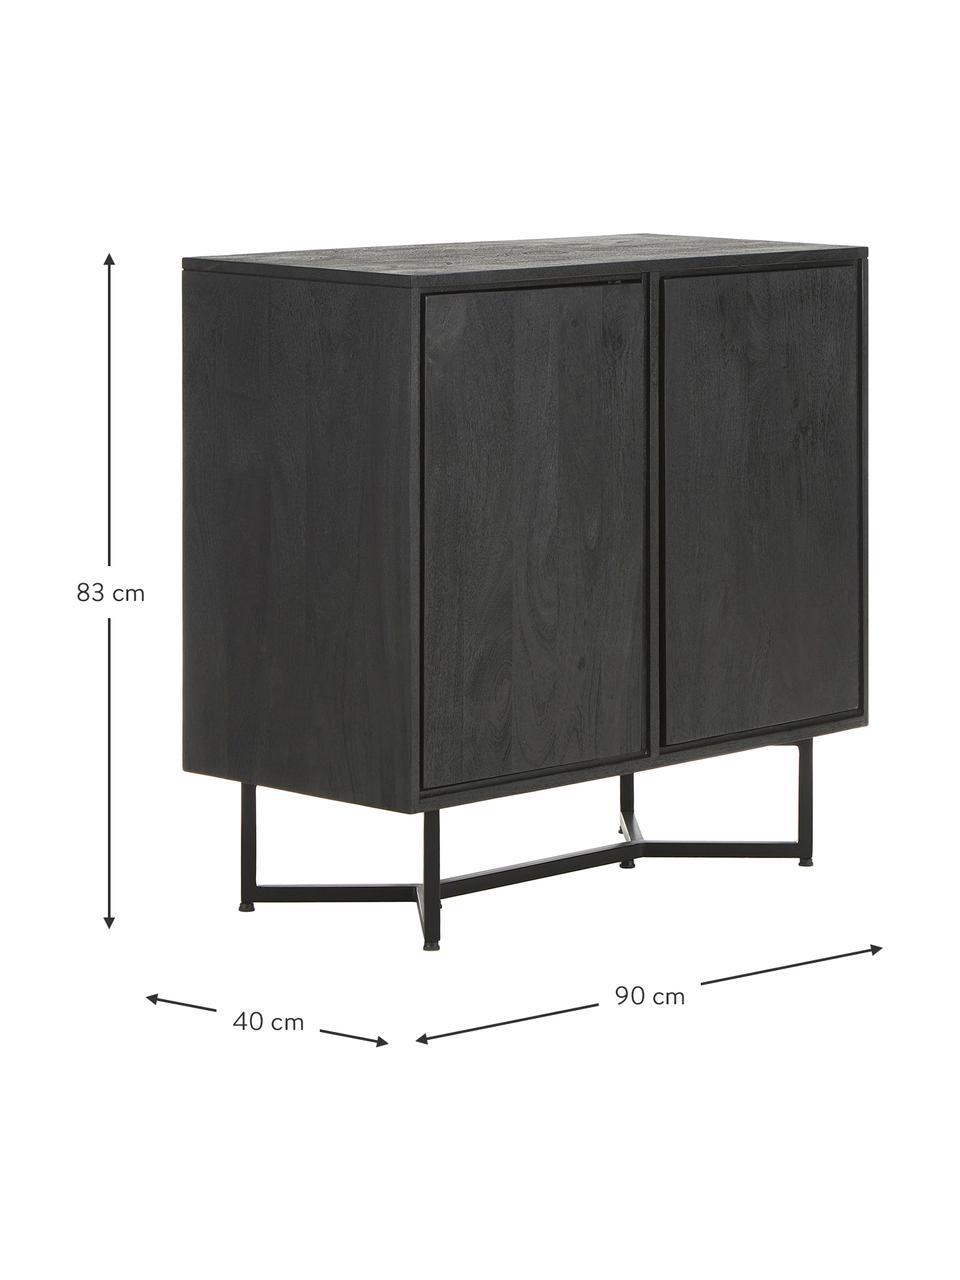 Sideboard Luca aus Massivholz in Schwarz, Korpus: Massives Mangoholz, lacki, Füße: Metall, pulverbeschichtet, Schwarz, 90 x 83 cm